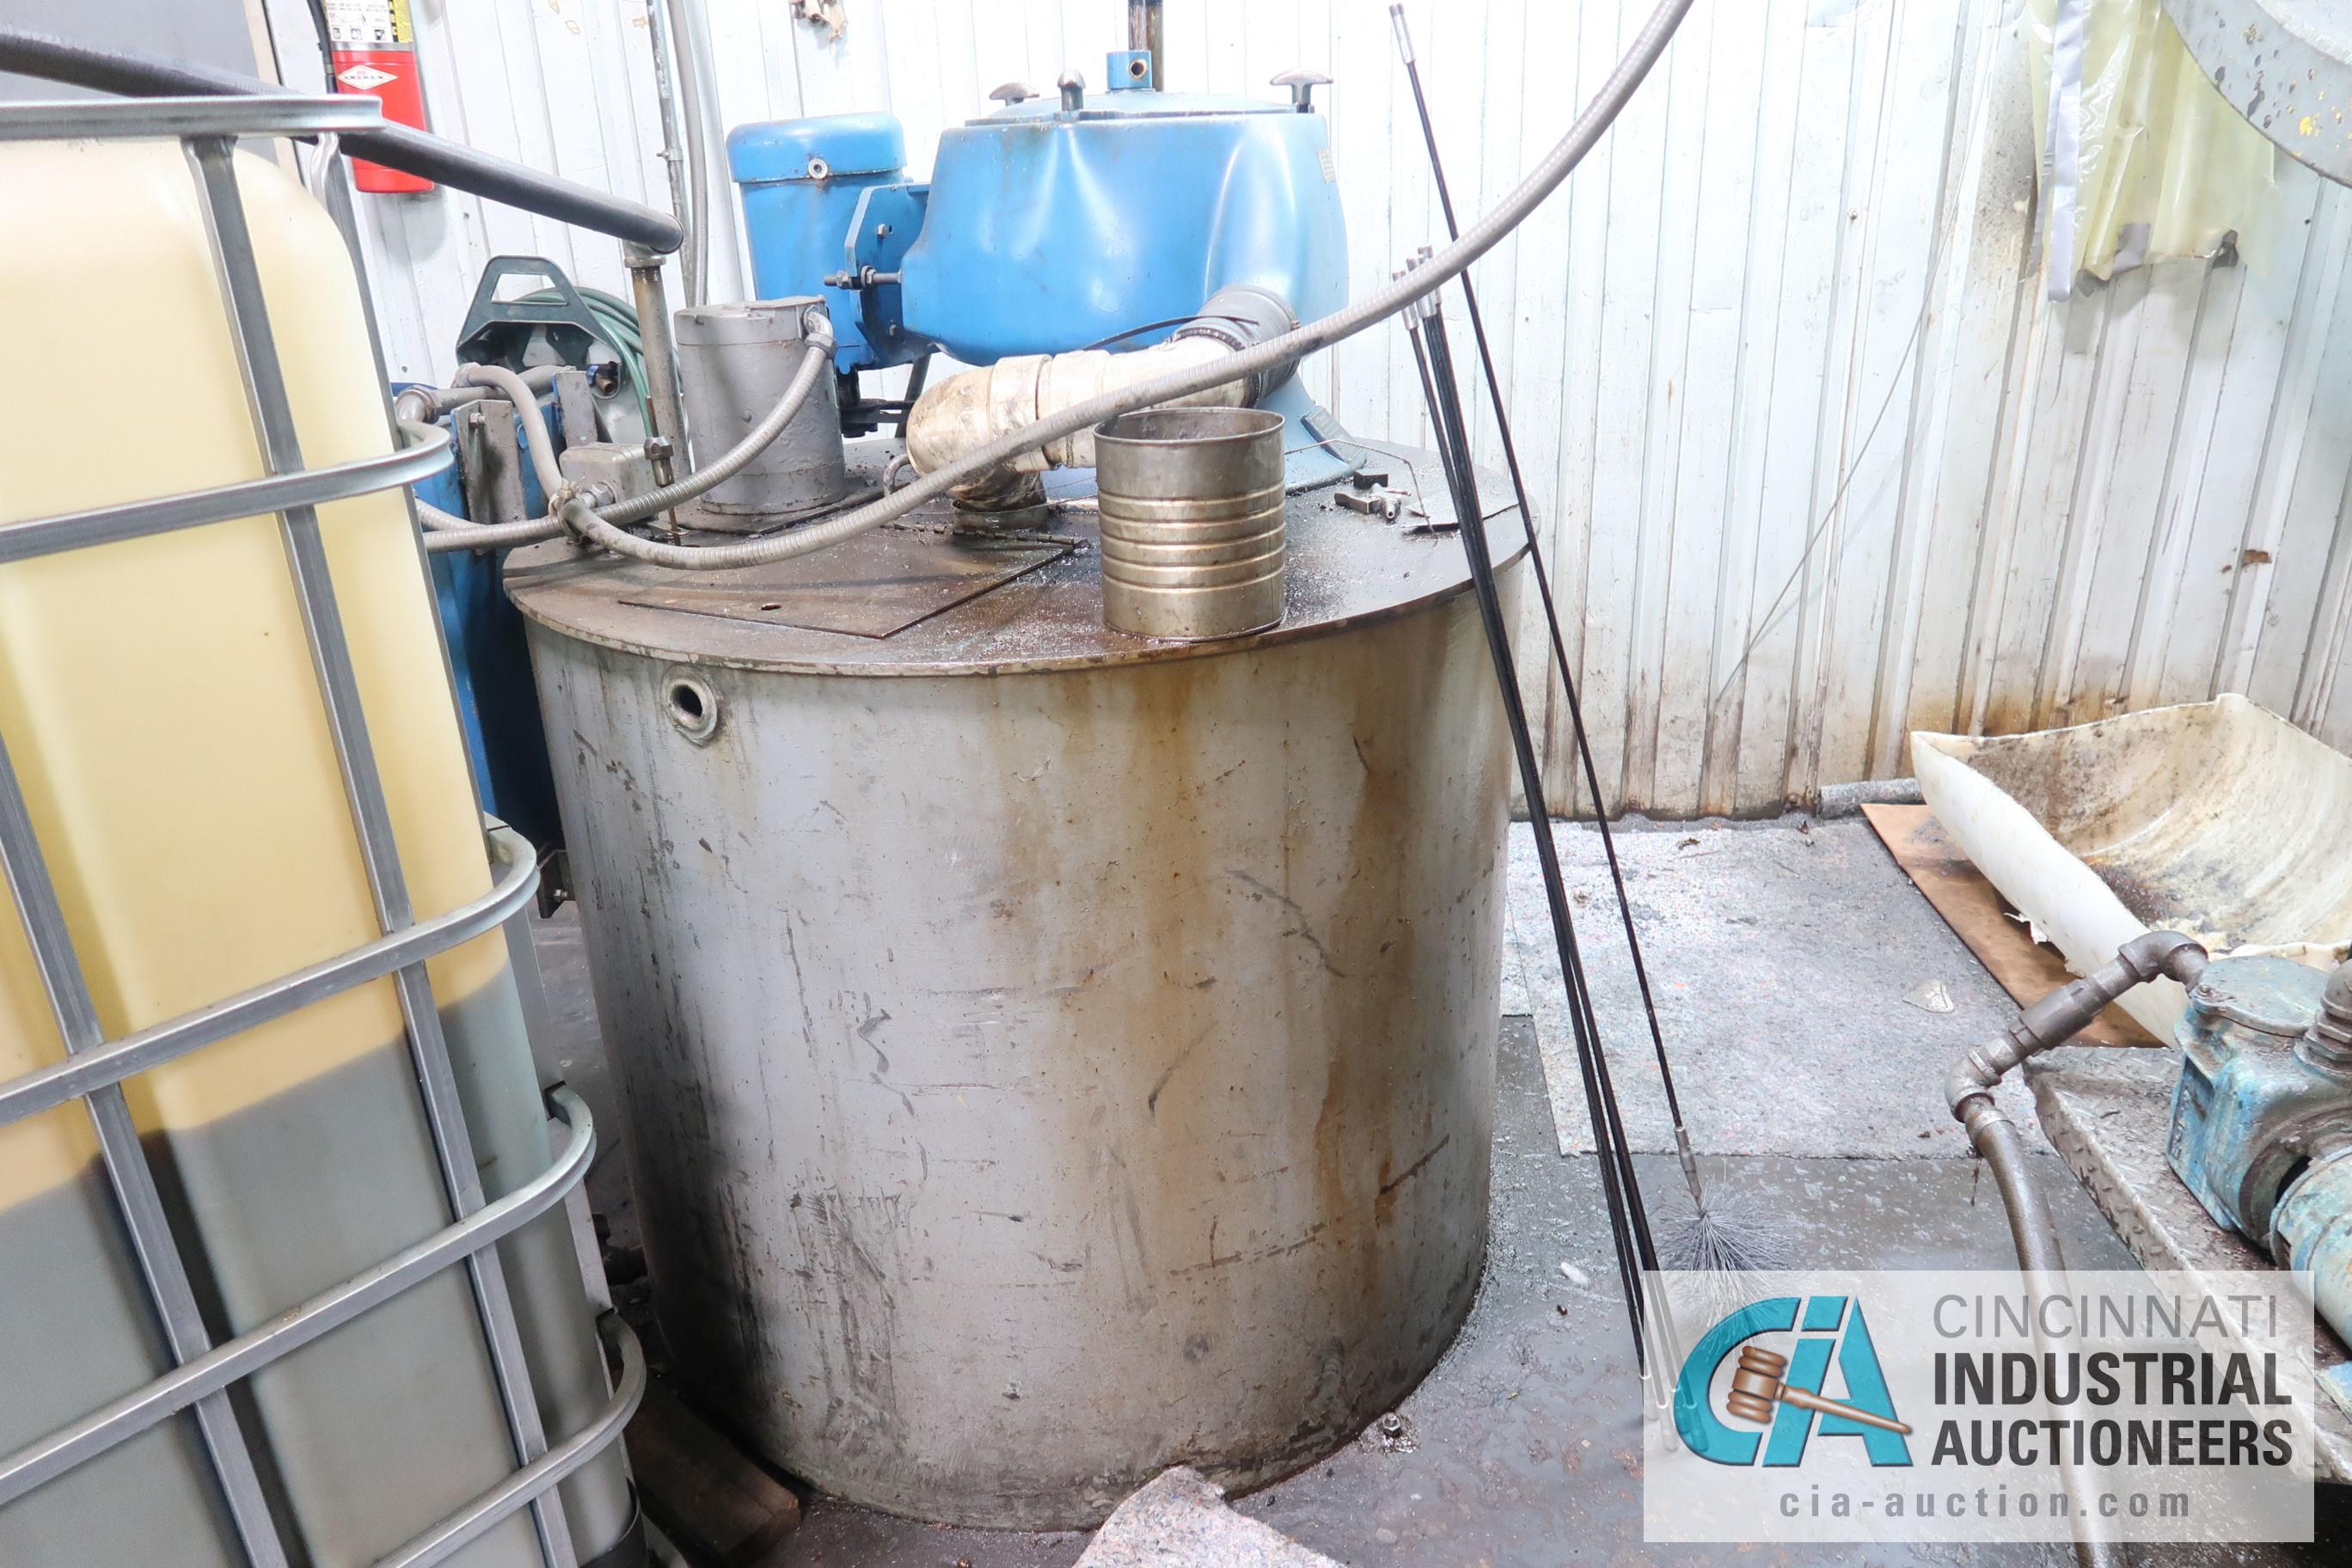 Lot 35 - BARRETT CENTRIFUGAL MODEL CHIP WRINGER & OIL RECLAMATION SYSTEM; S/N 136385F, WITH BARRETT